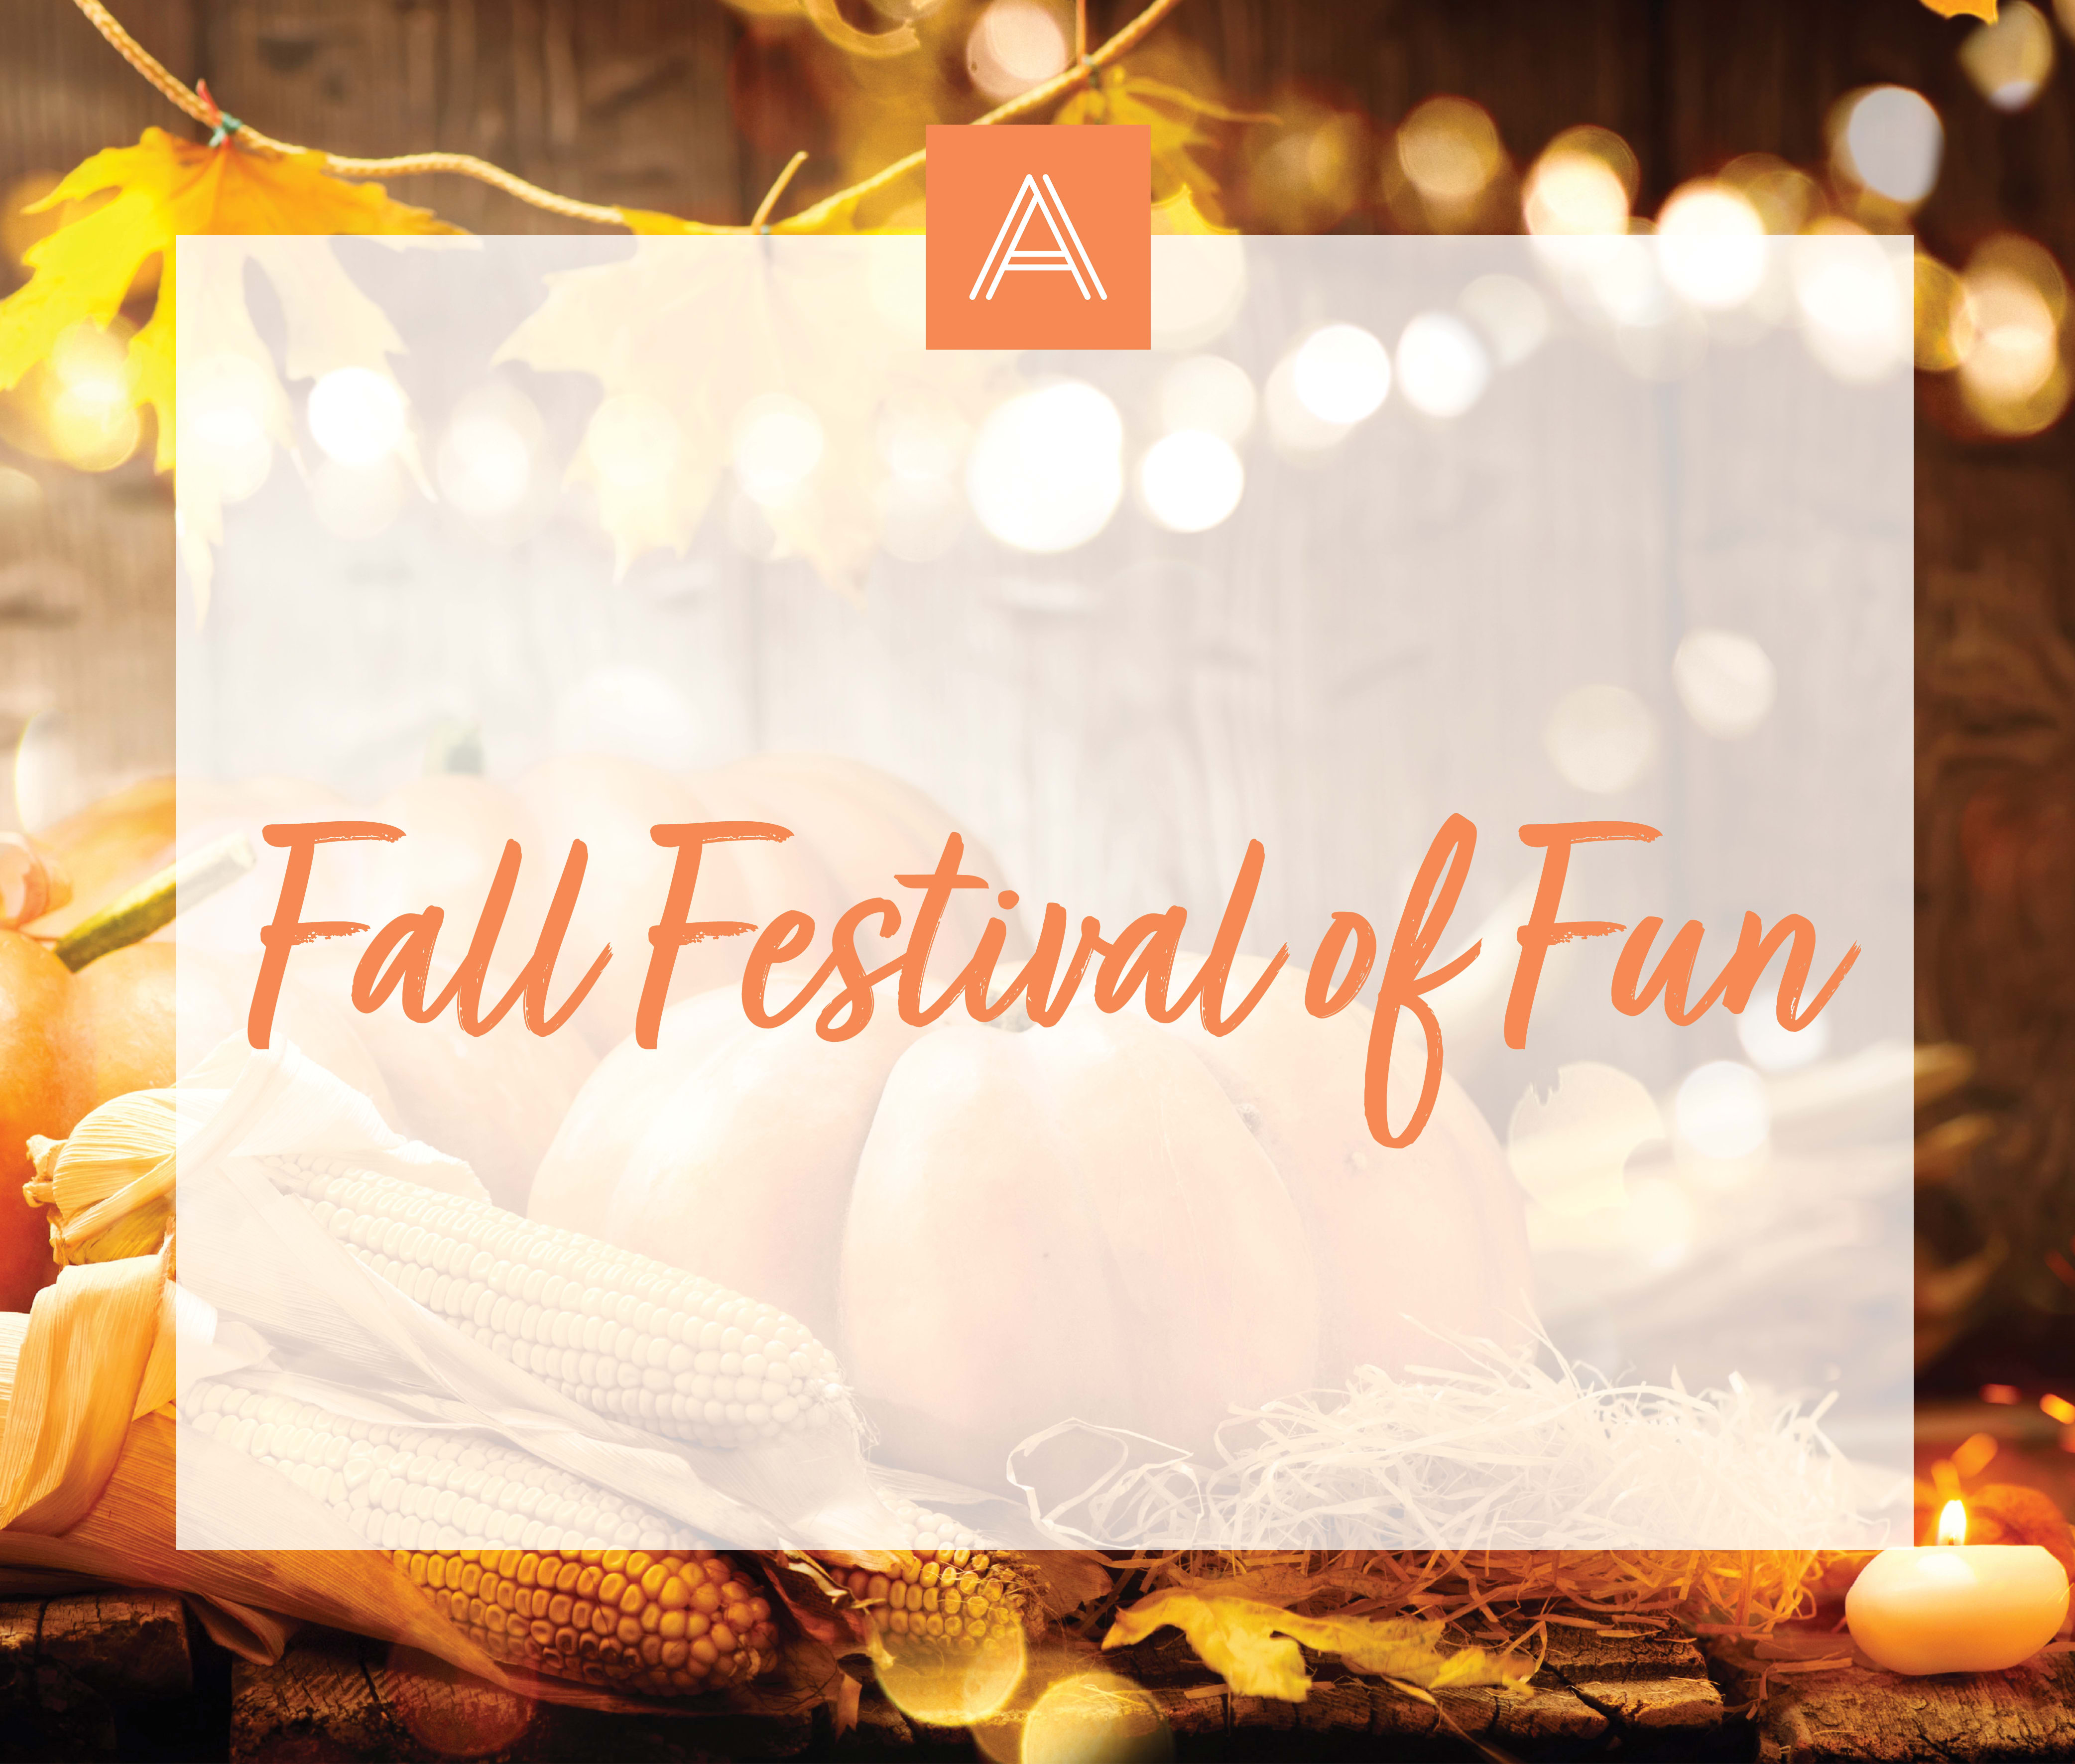 Fall Festival of Fun